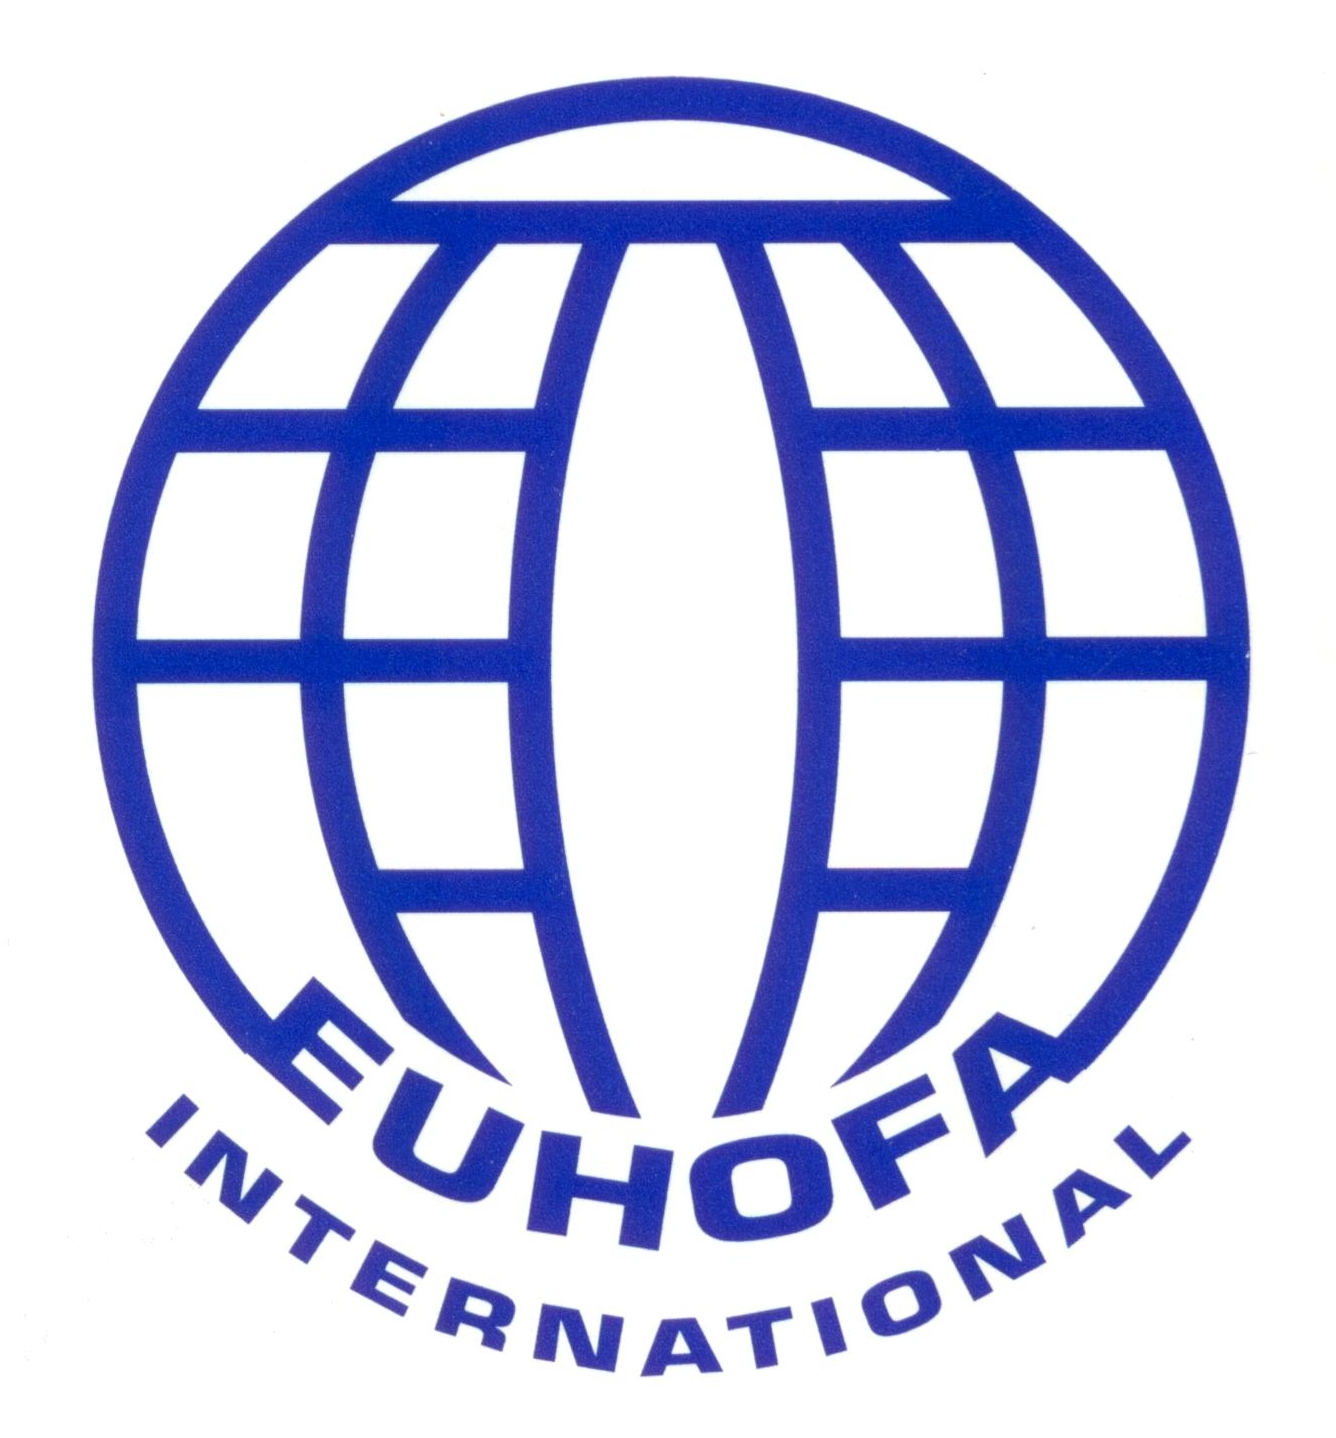 Hotelschool | EUHOFA International